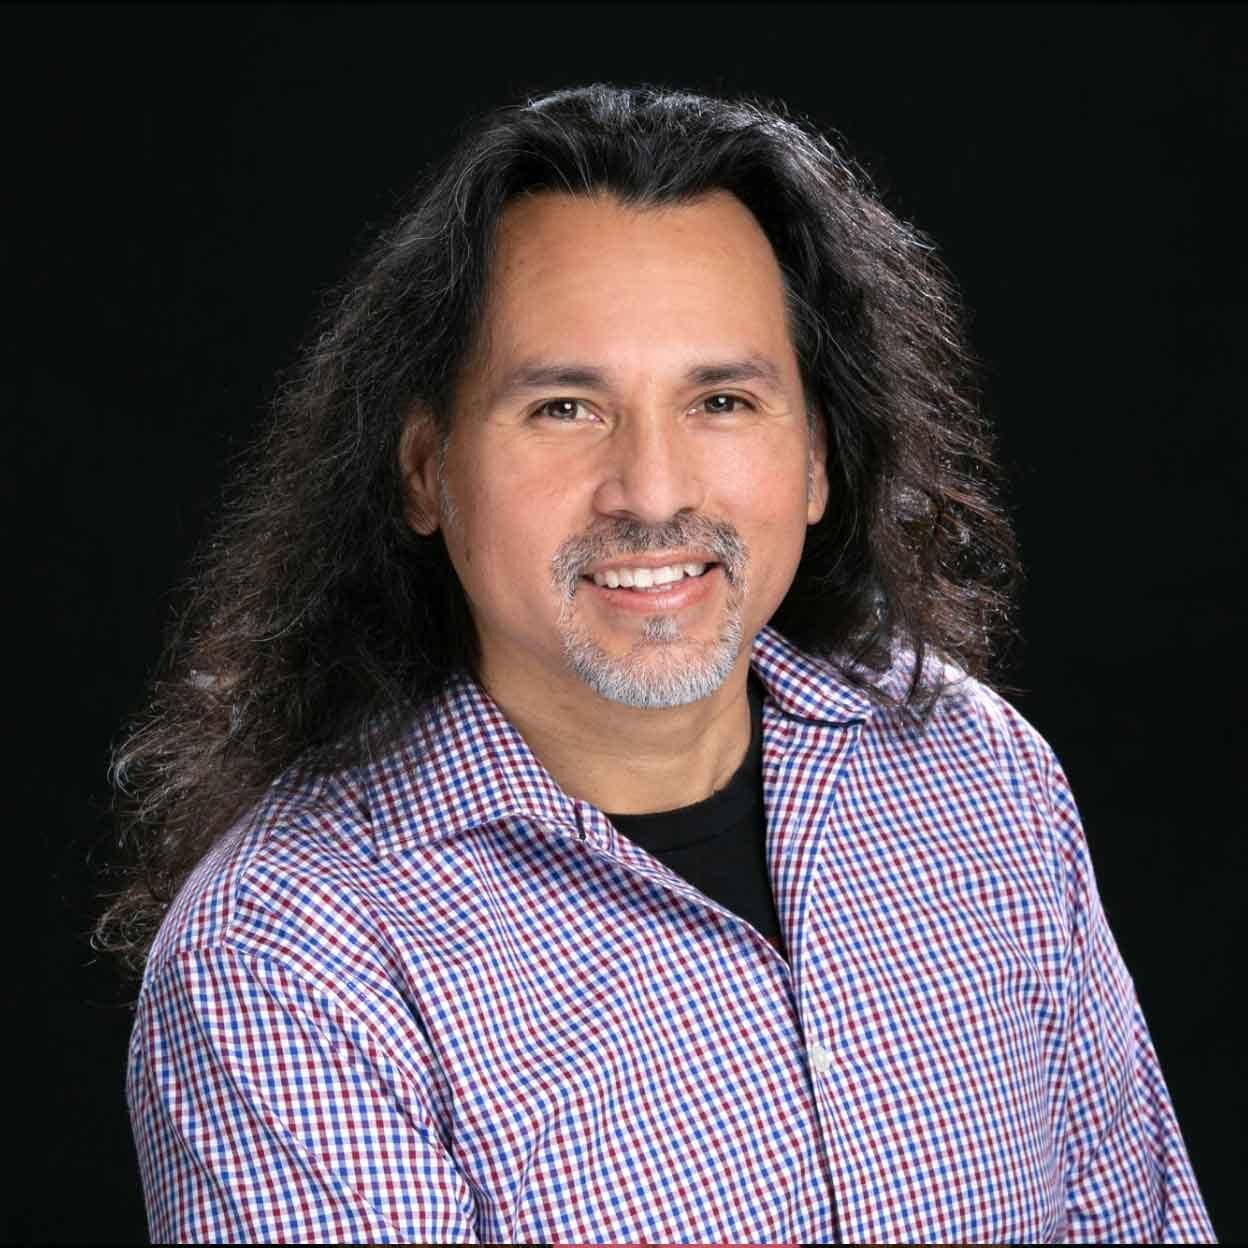 Eddy Pareja